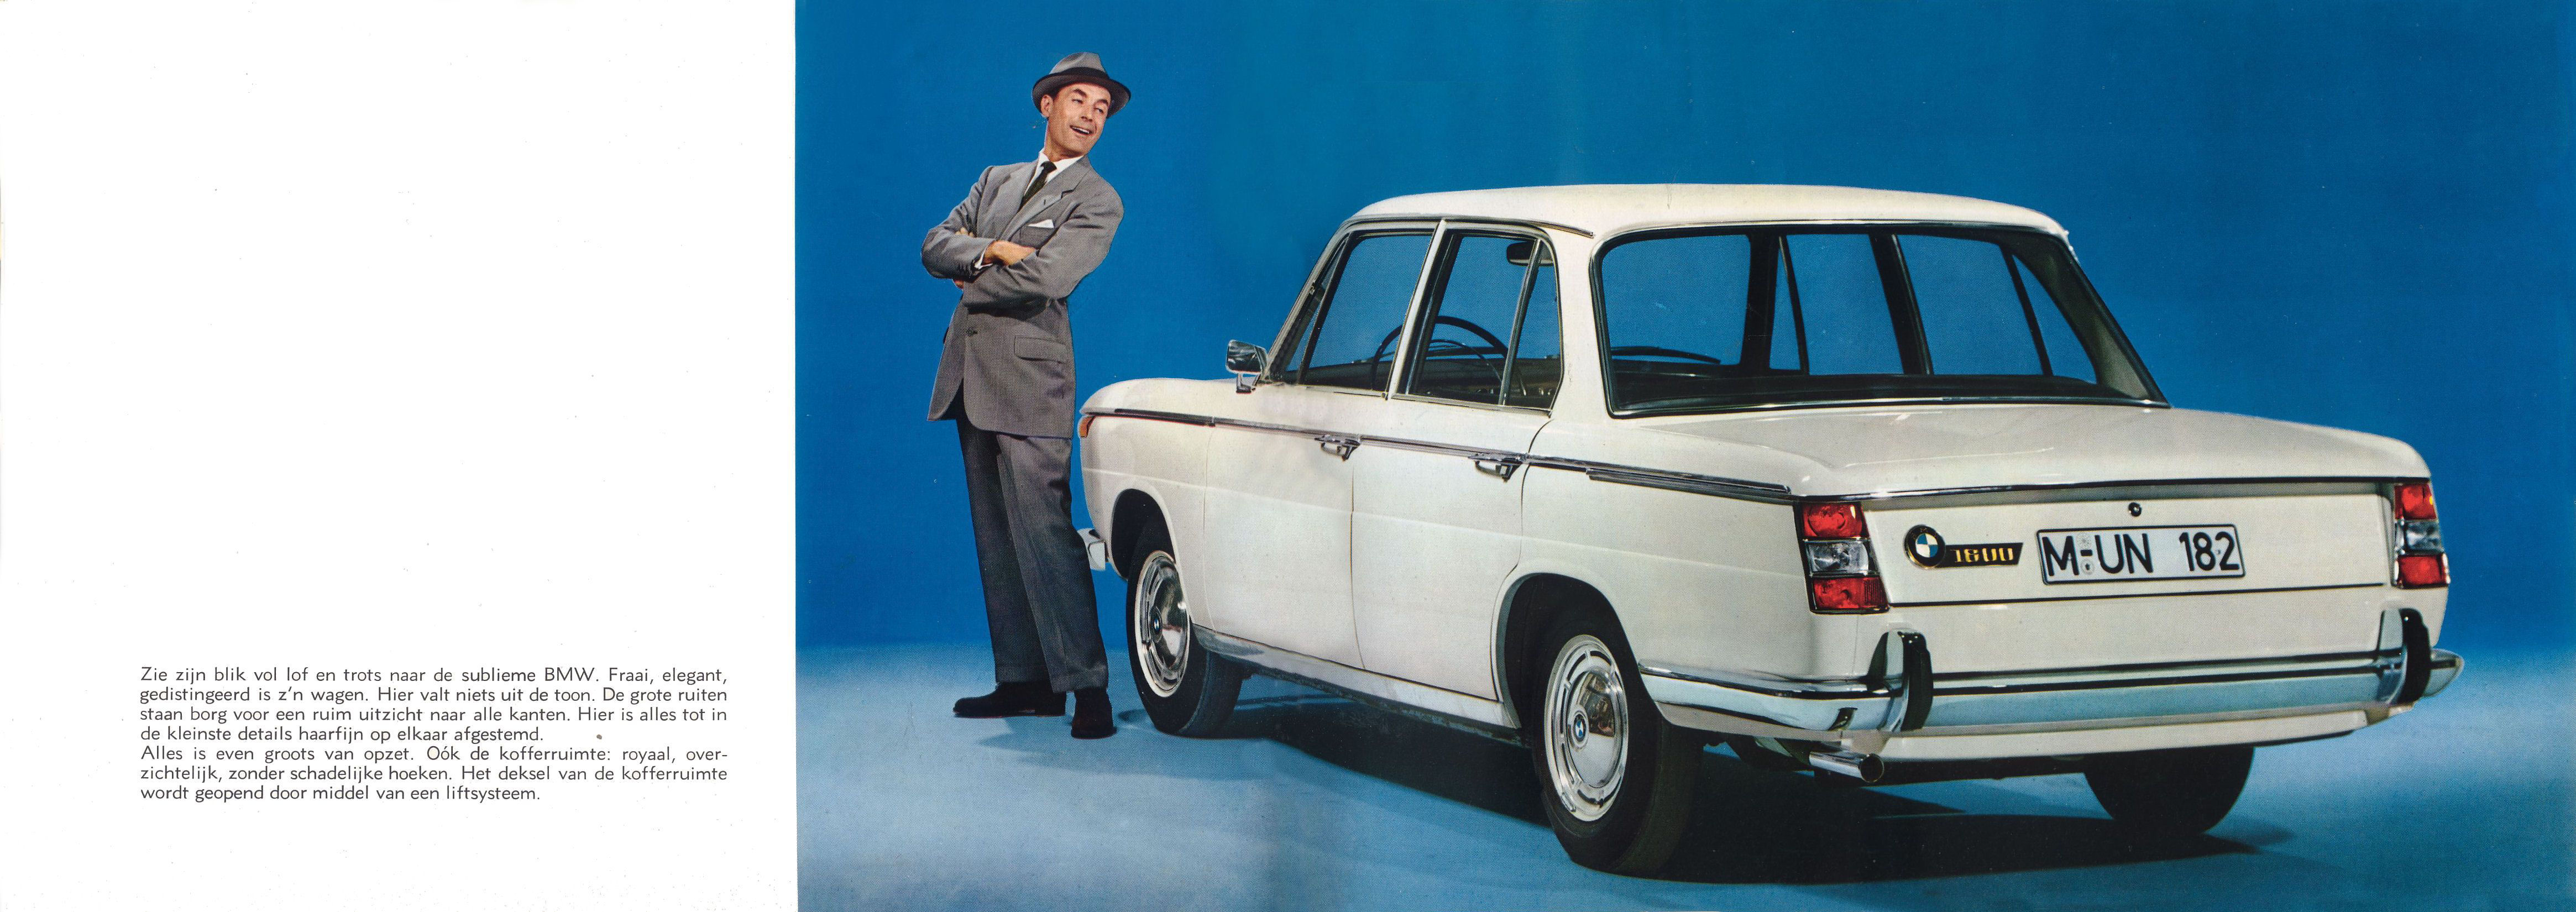 Bmw >> 1966 BMW 1800 brochure